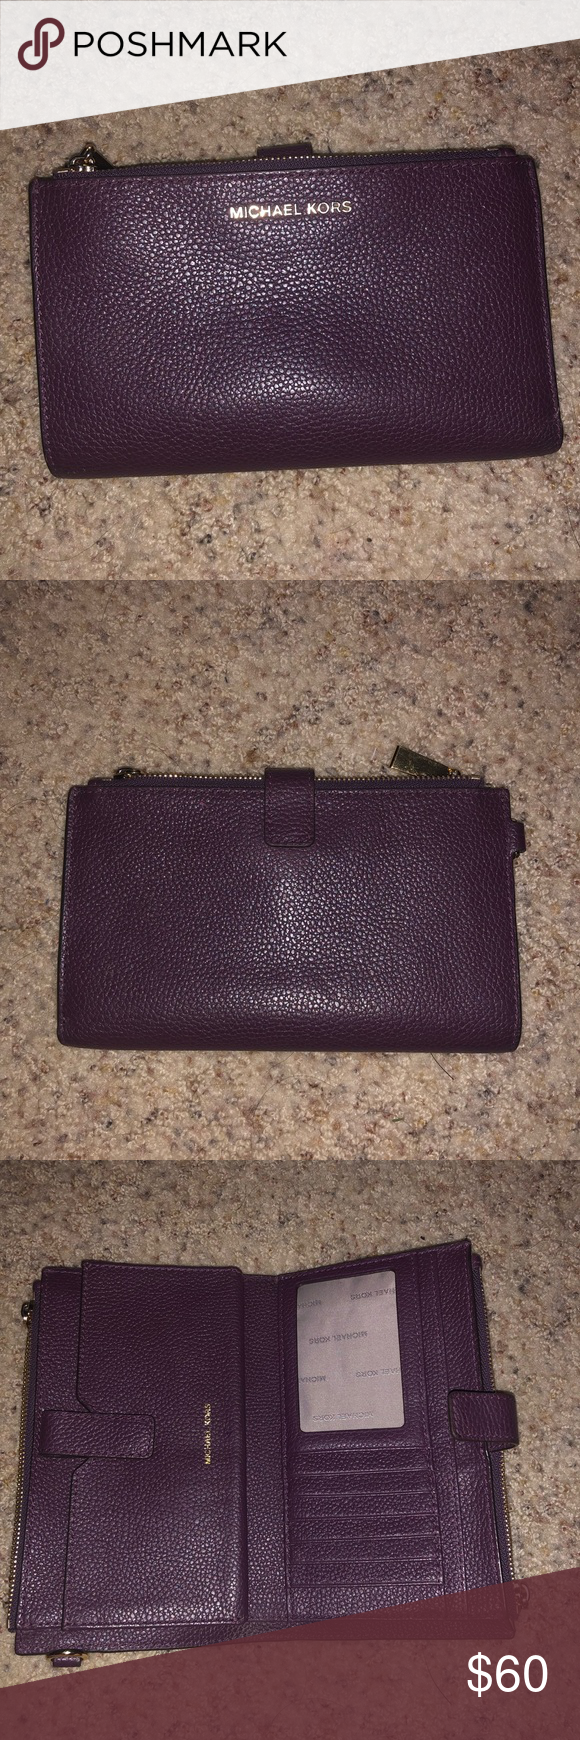 Michael Kors Phone Wallet Wallet Michael Kors Phone Wallet